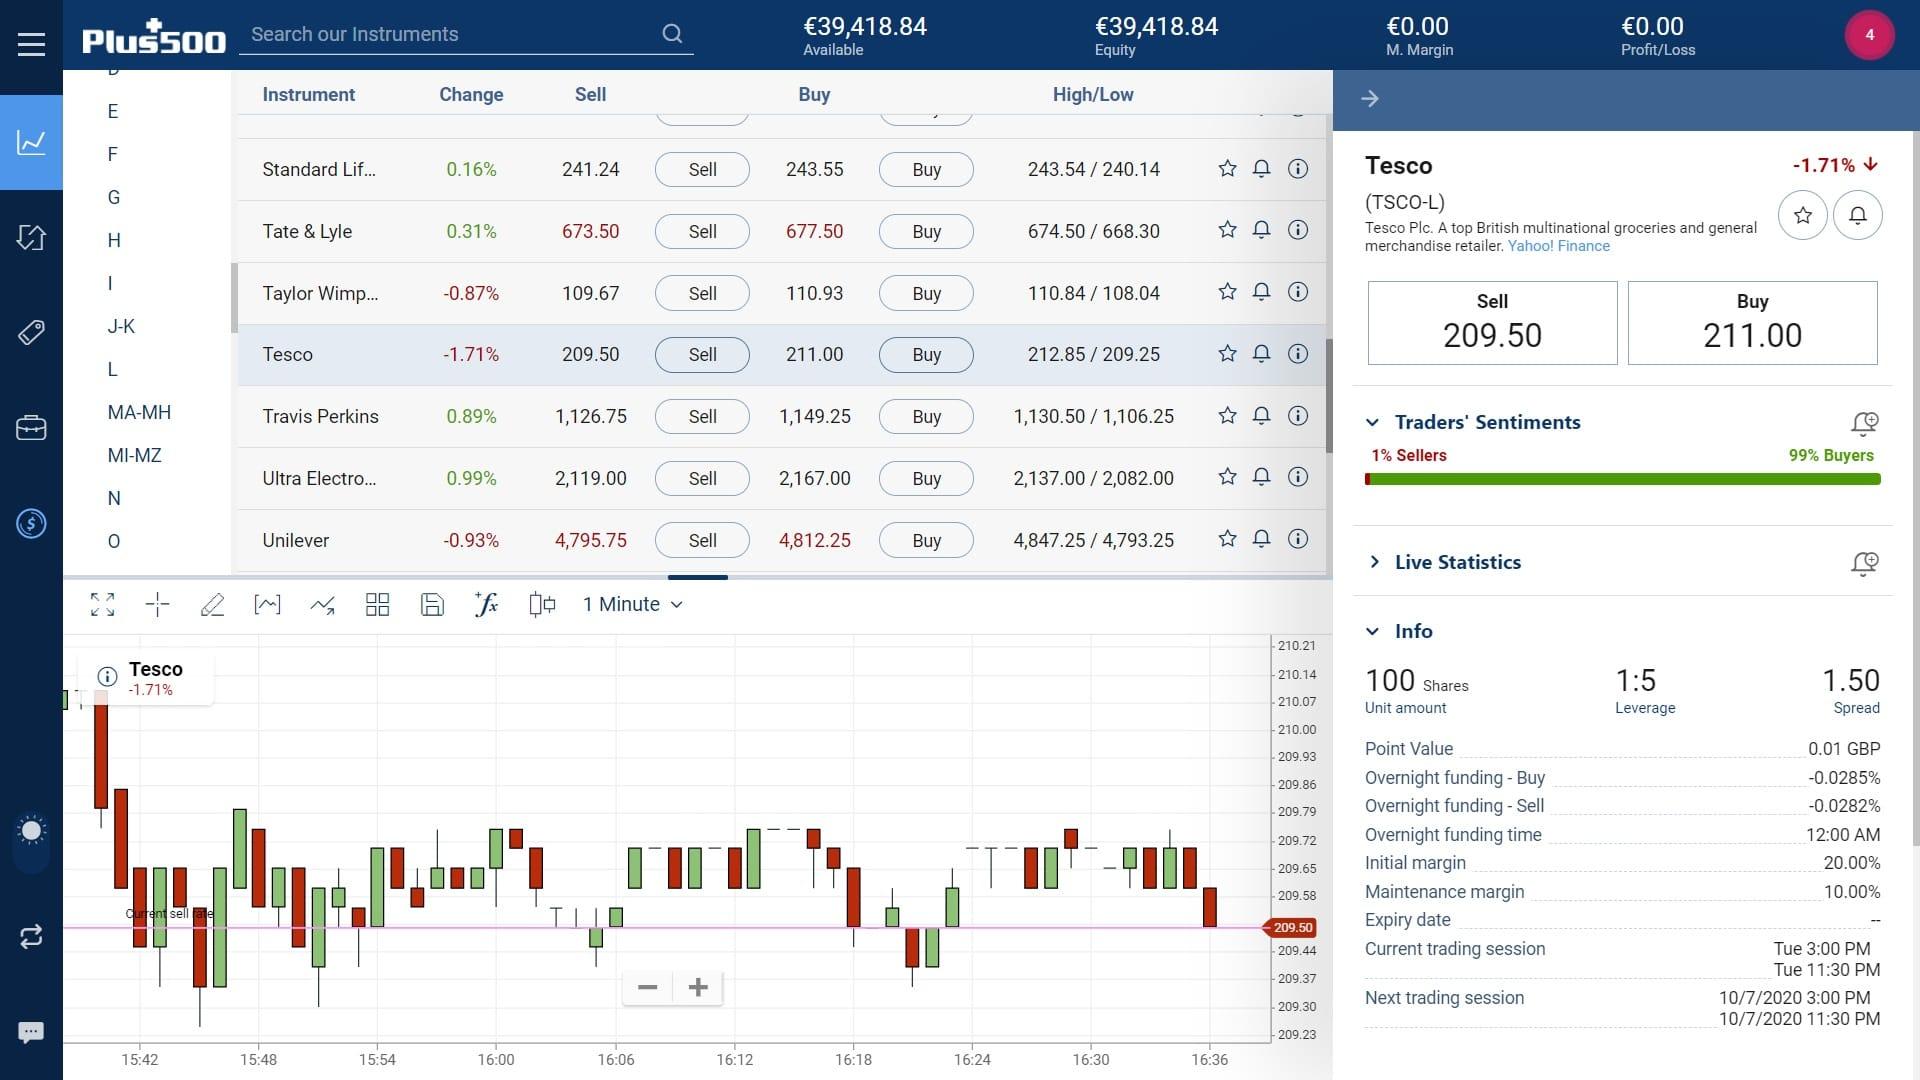 Tesco stock trading on Plus500's WebTrader platform